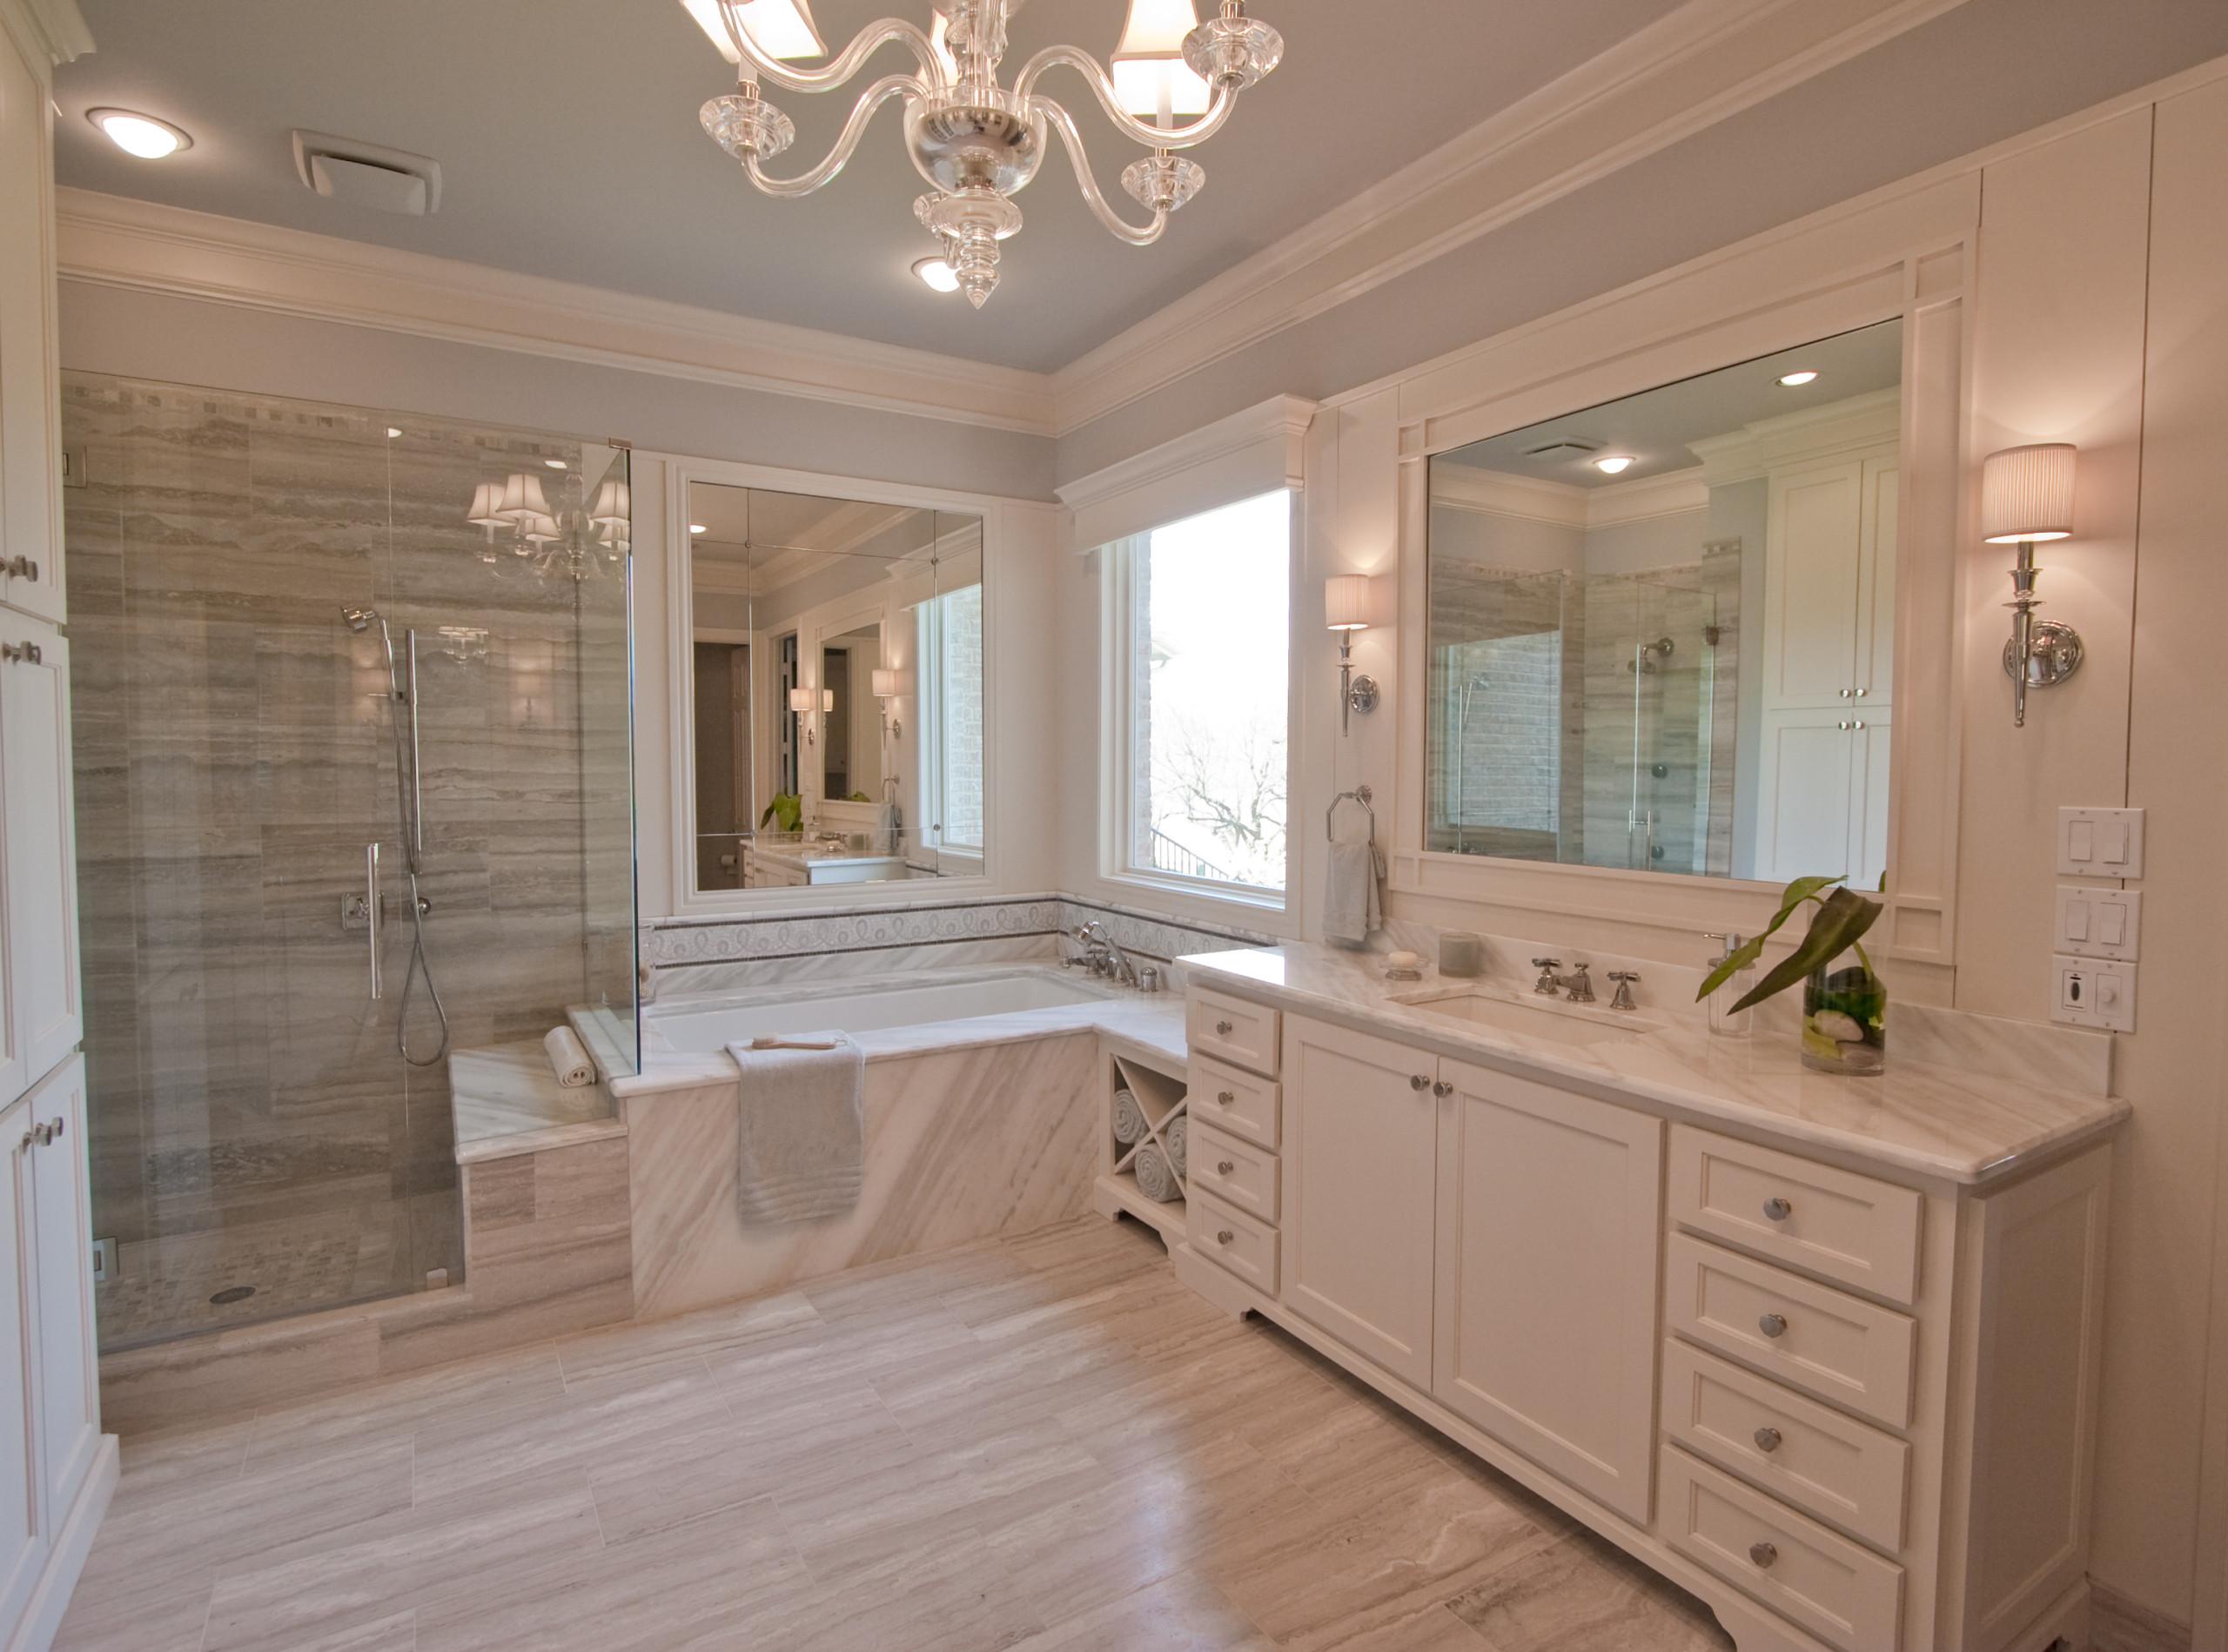 View of shower, tub & vanity